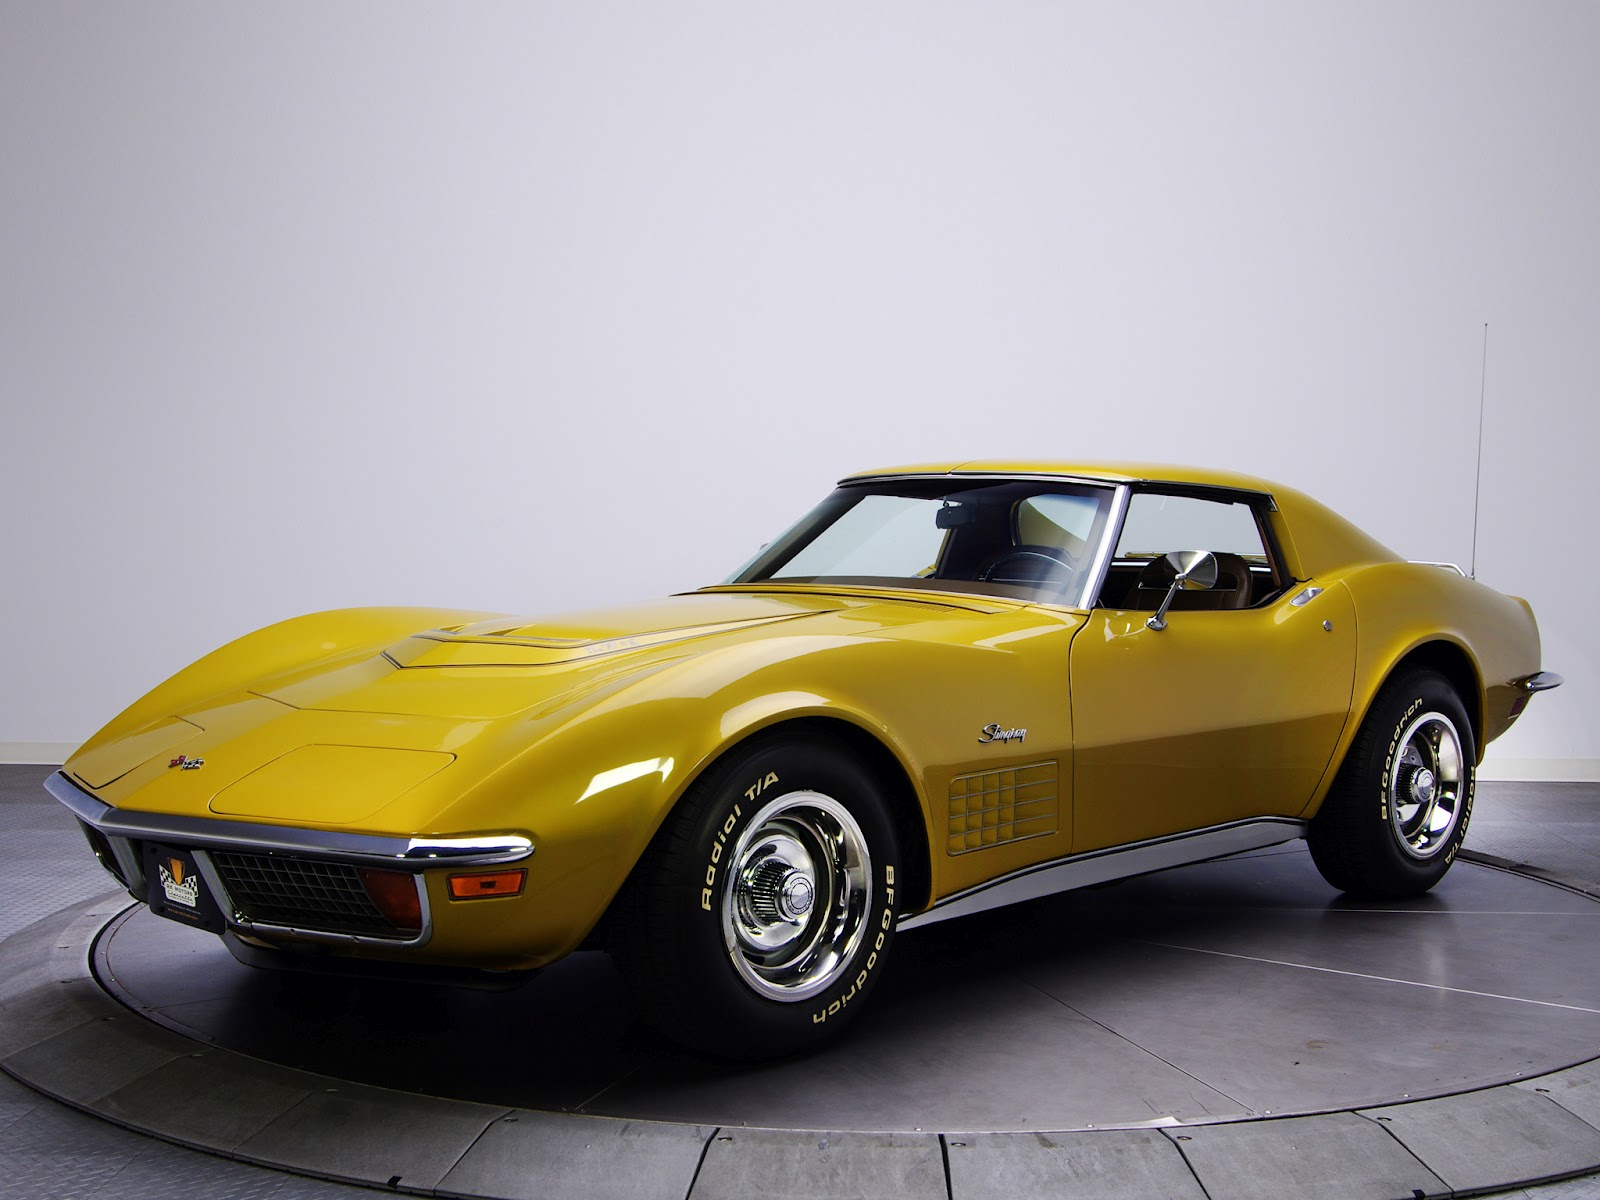 1971 Toyota Land Cruiser Retro Cars: Corvette Stingray 350 LT1 (C3) '1970–72